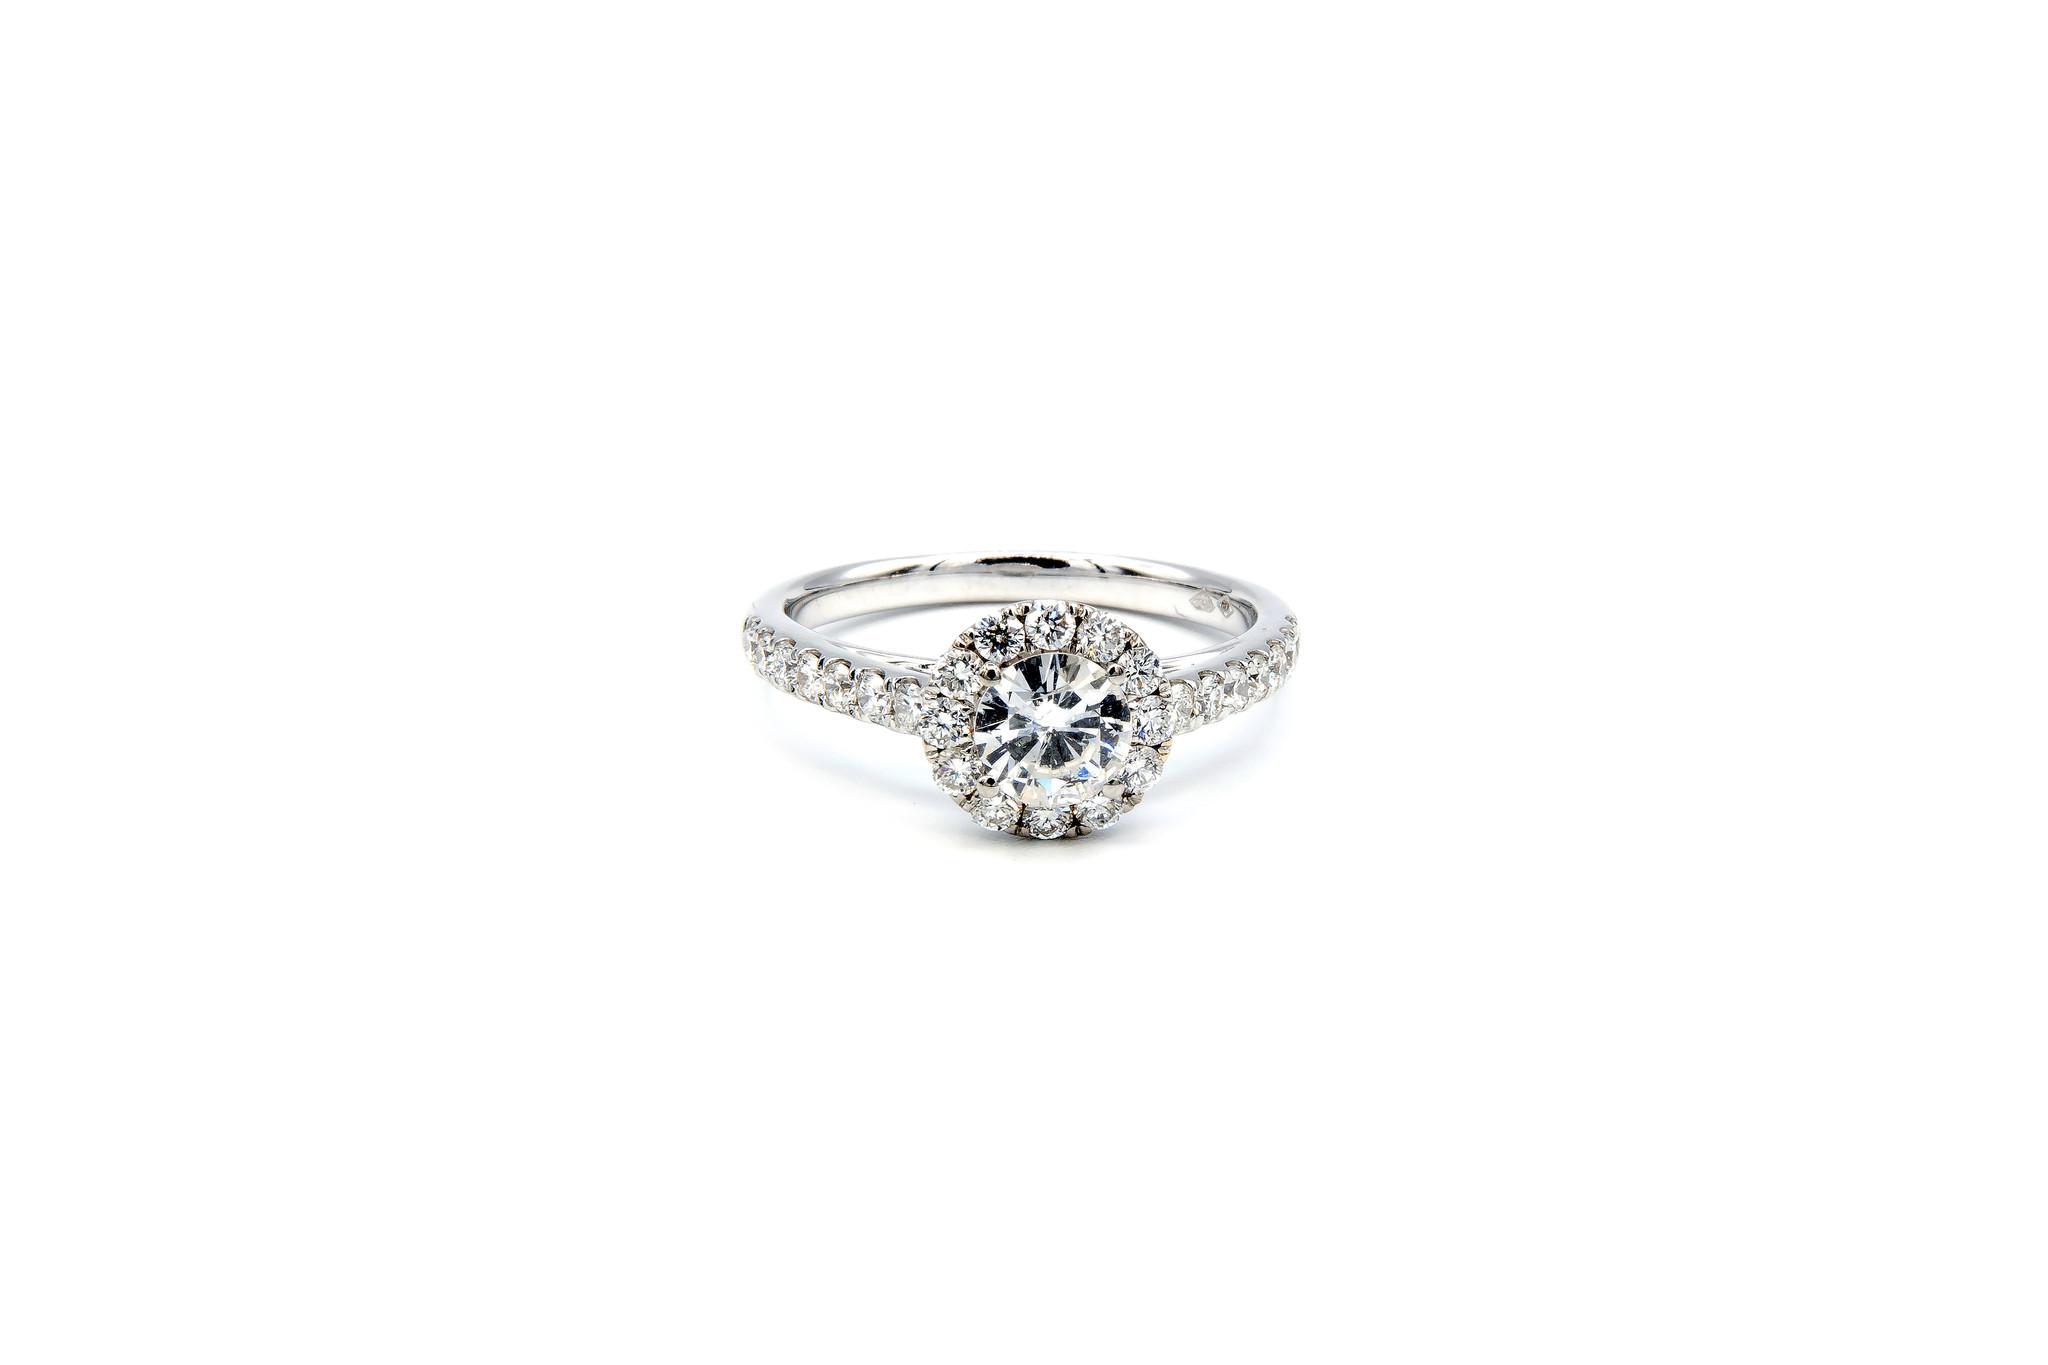 Ring verlovingsring witgoud met 0,5 ct SI en 0,59 ct VS diamant-1